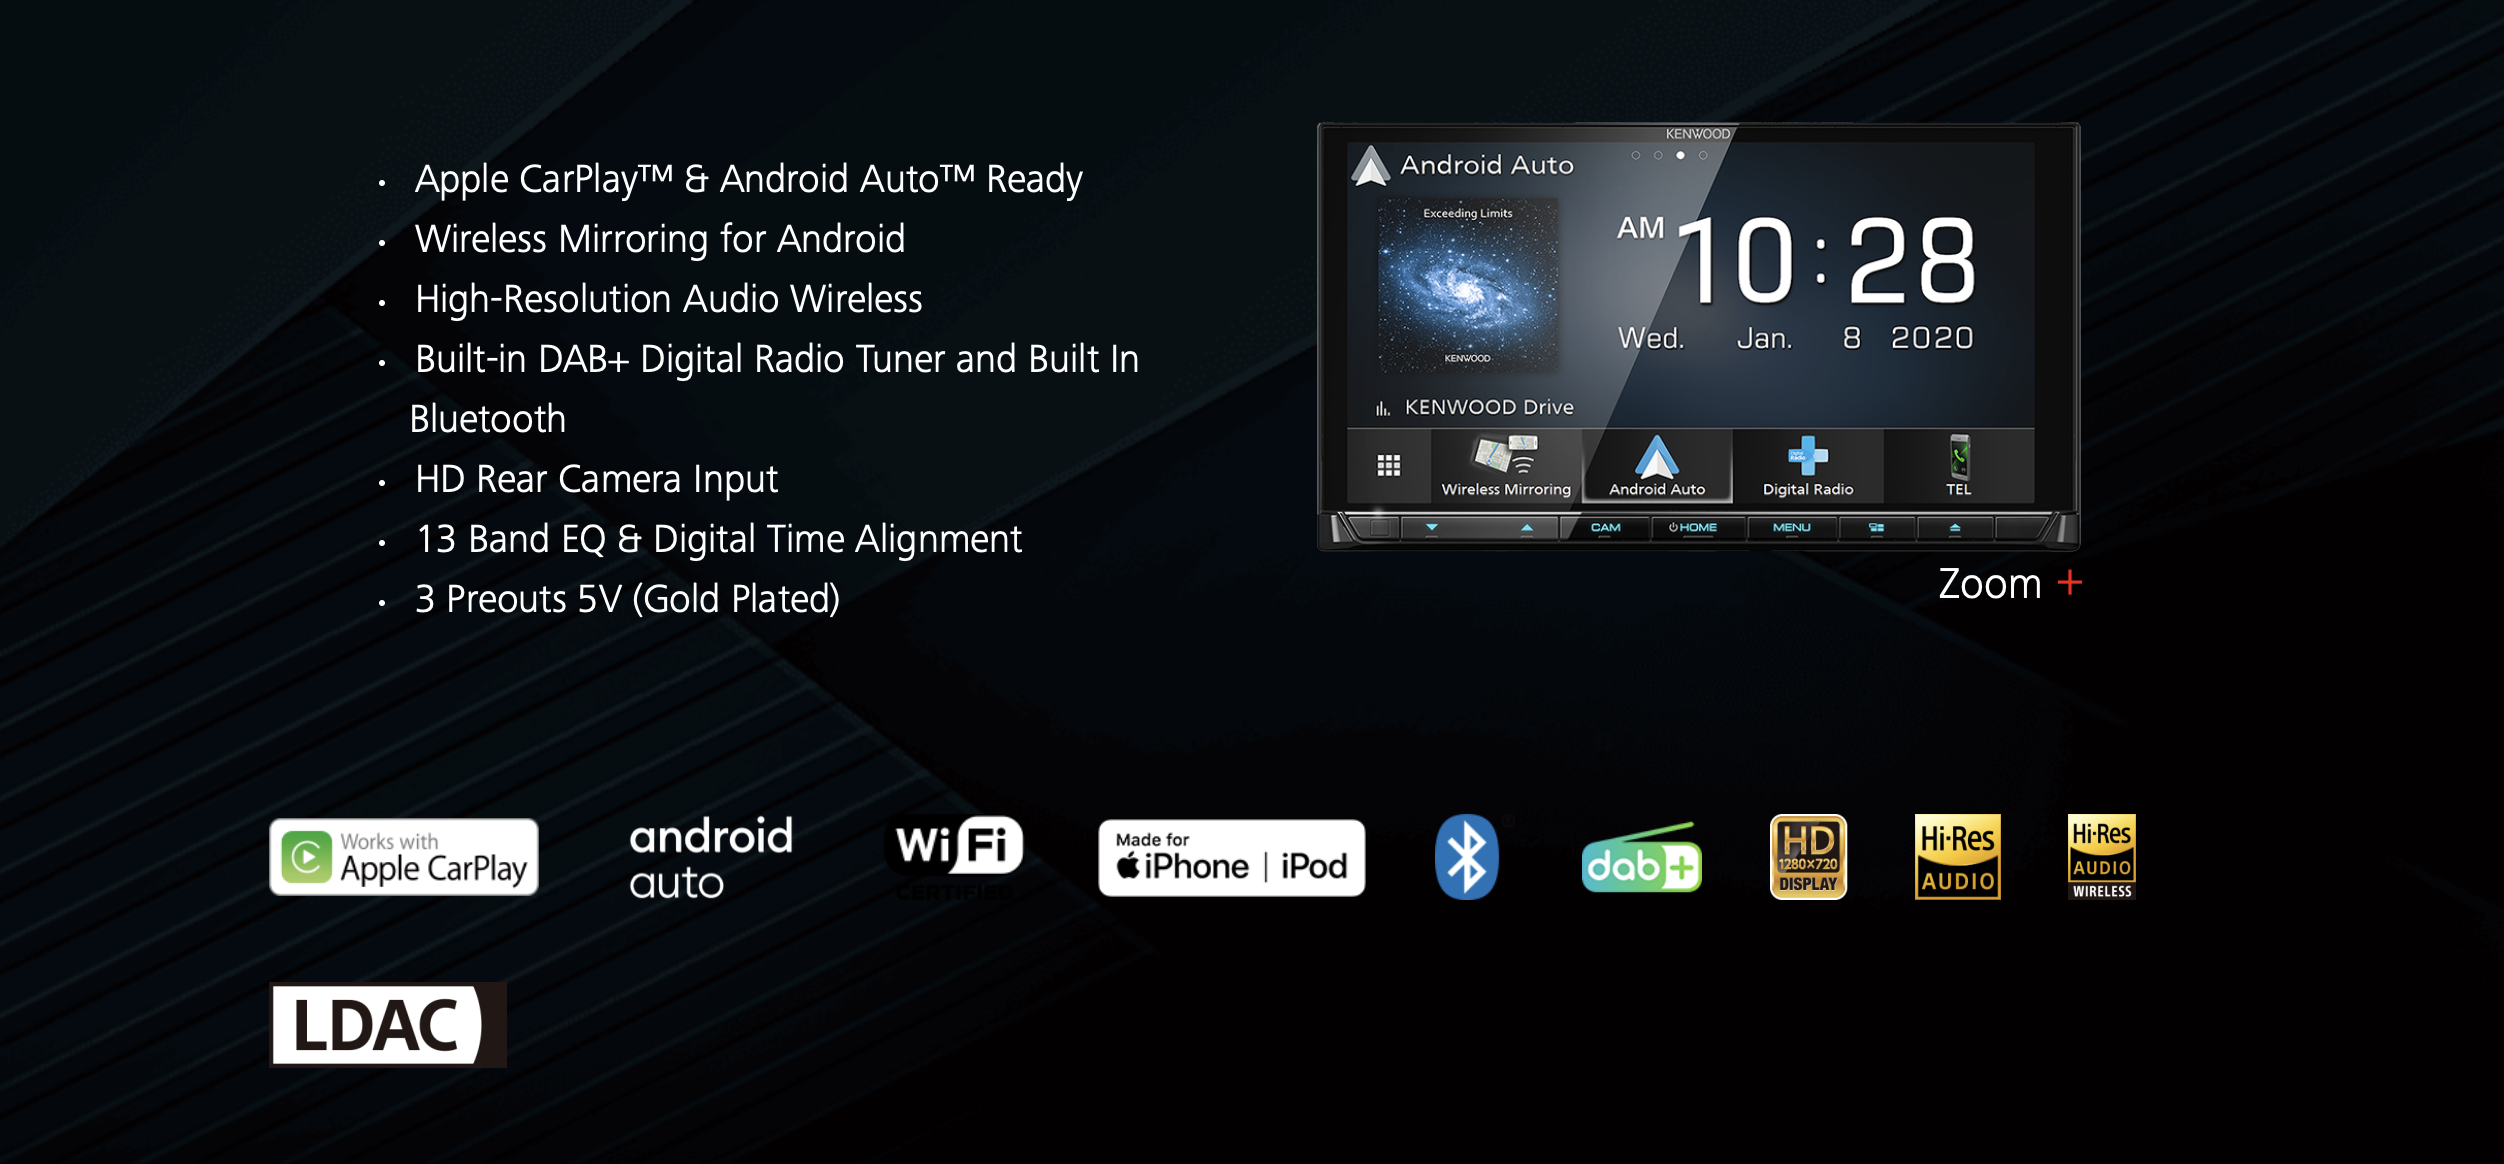 Kenwood DDX9020DABS Car Stereo